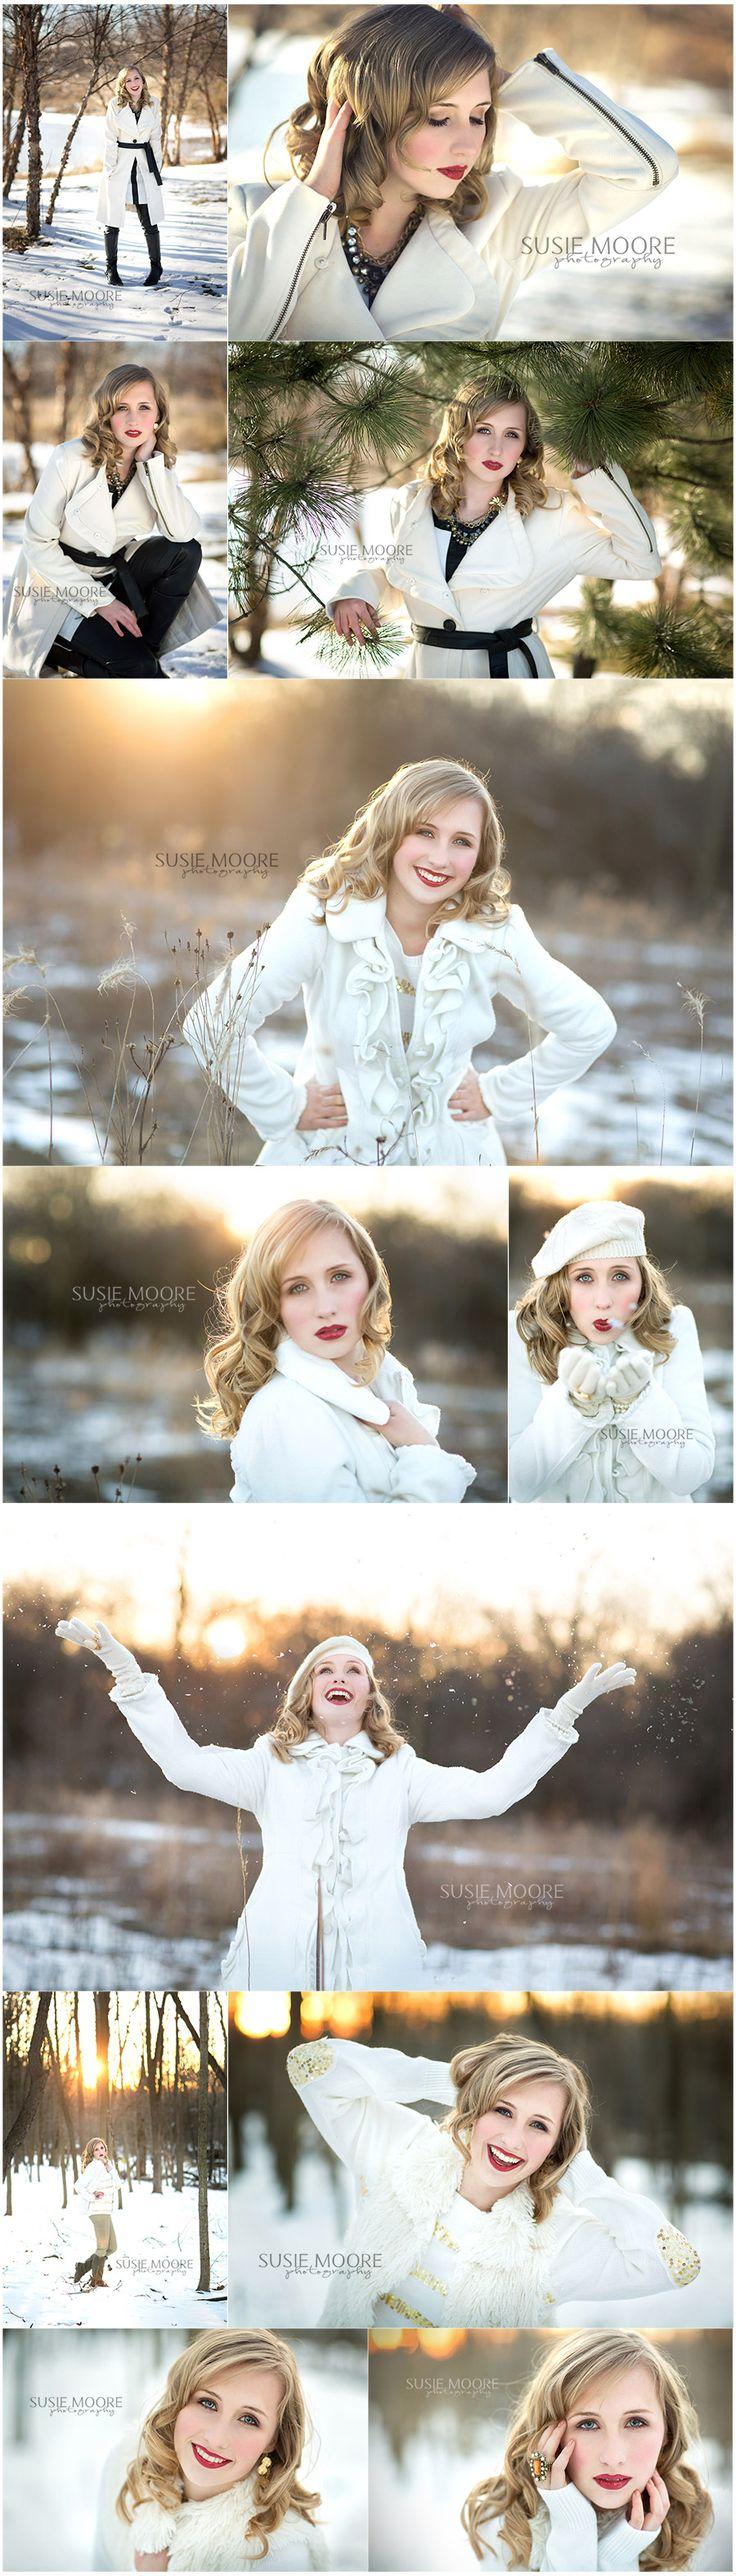 Lauren   Carl Sandburg High School   Class of 2013   Chicago Senior Photographer   Indianapolis Senior Photographer